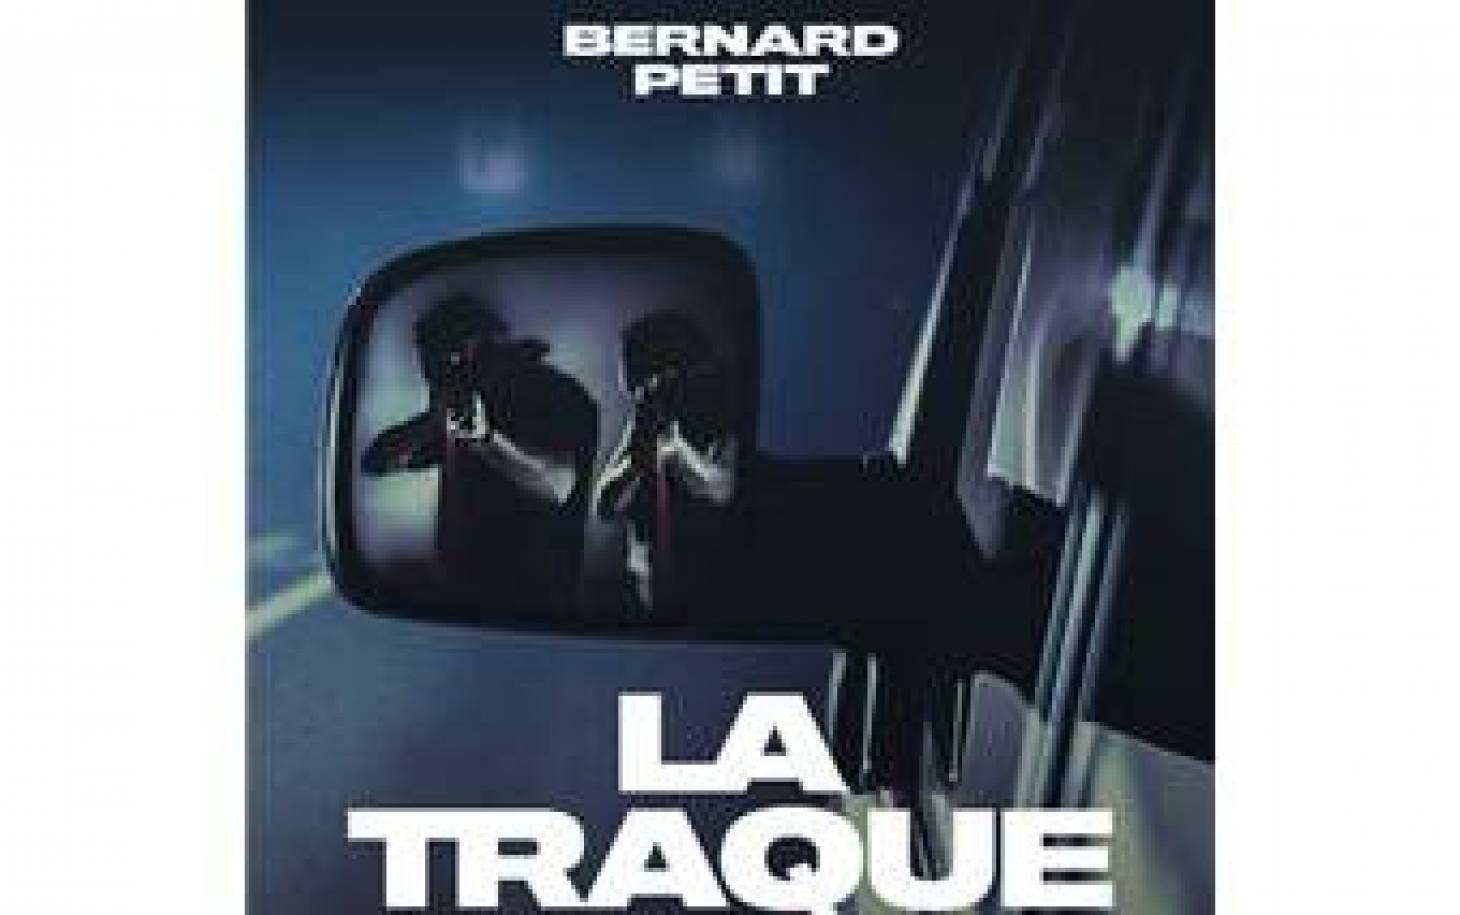 7 à lire - La Traque, de Bernard Petit